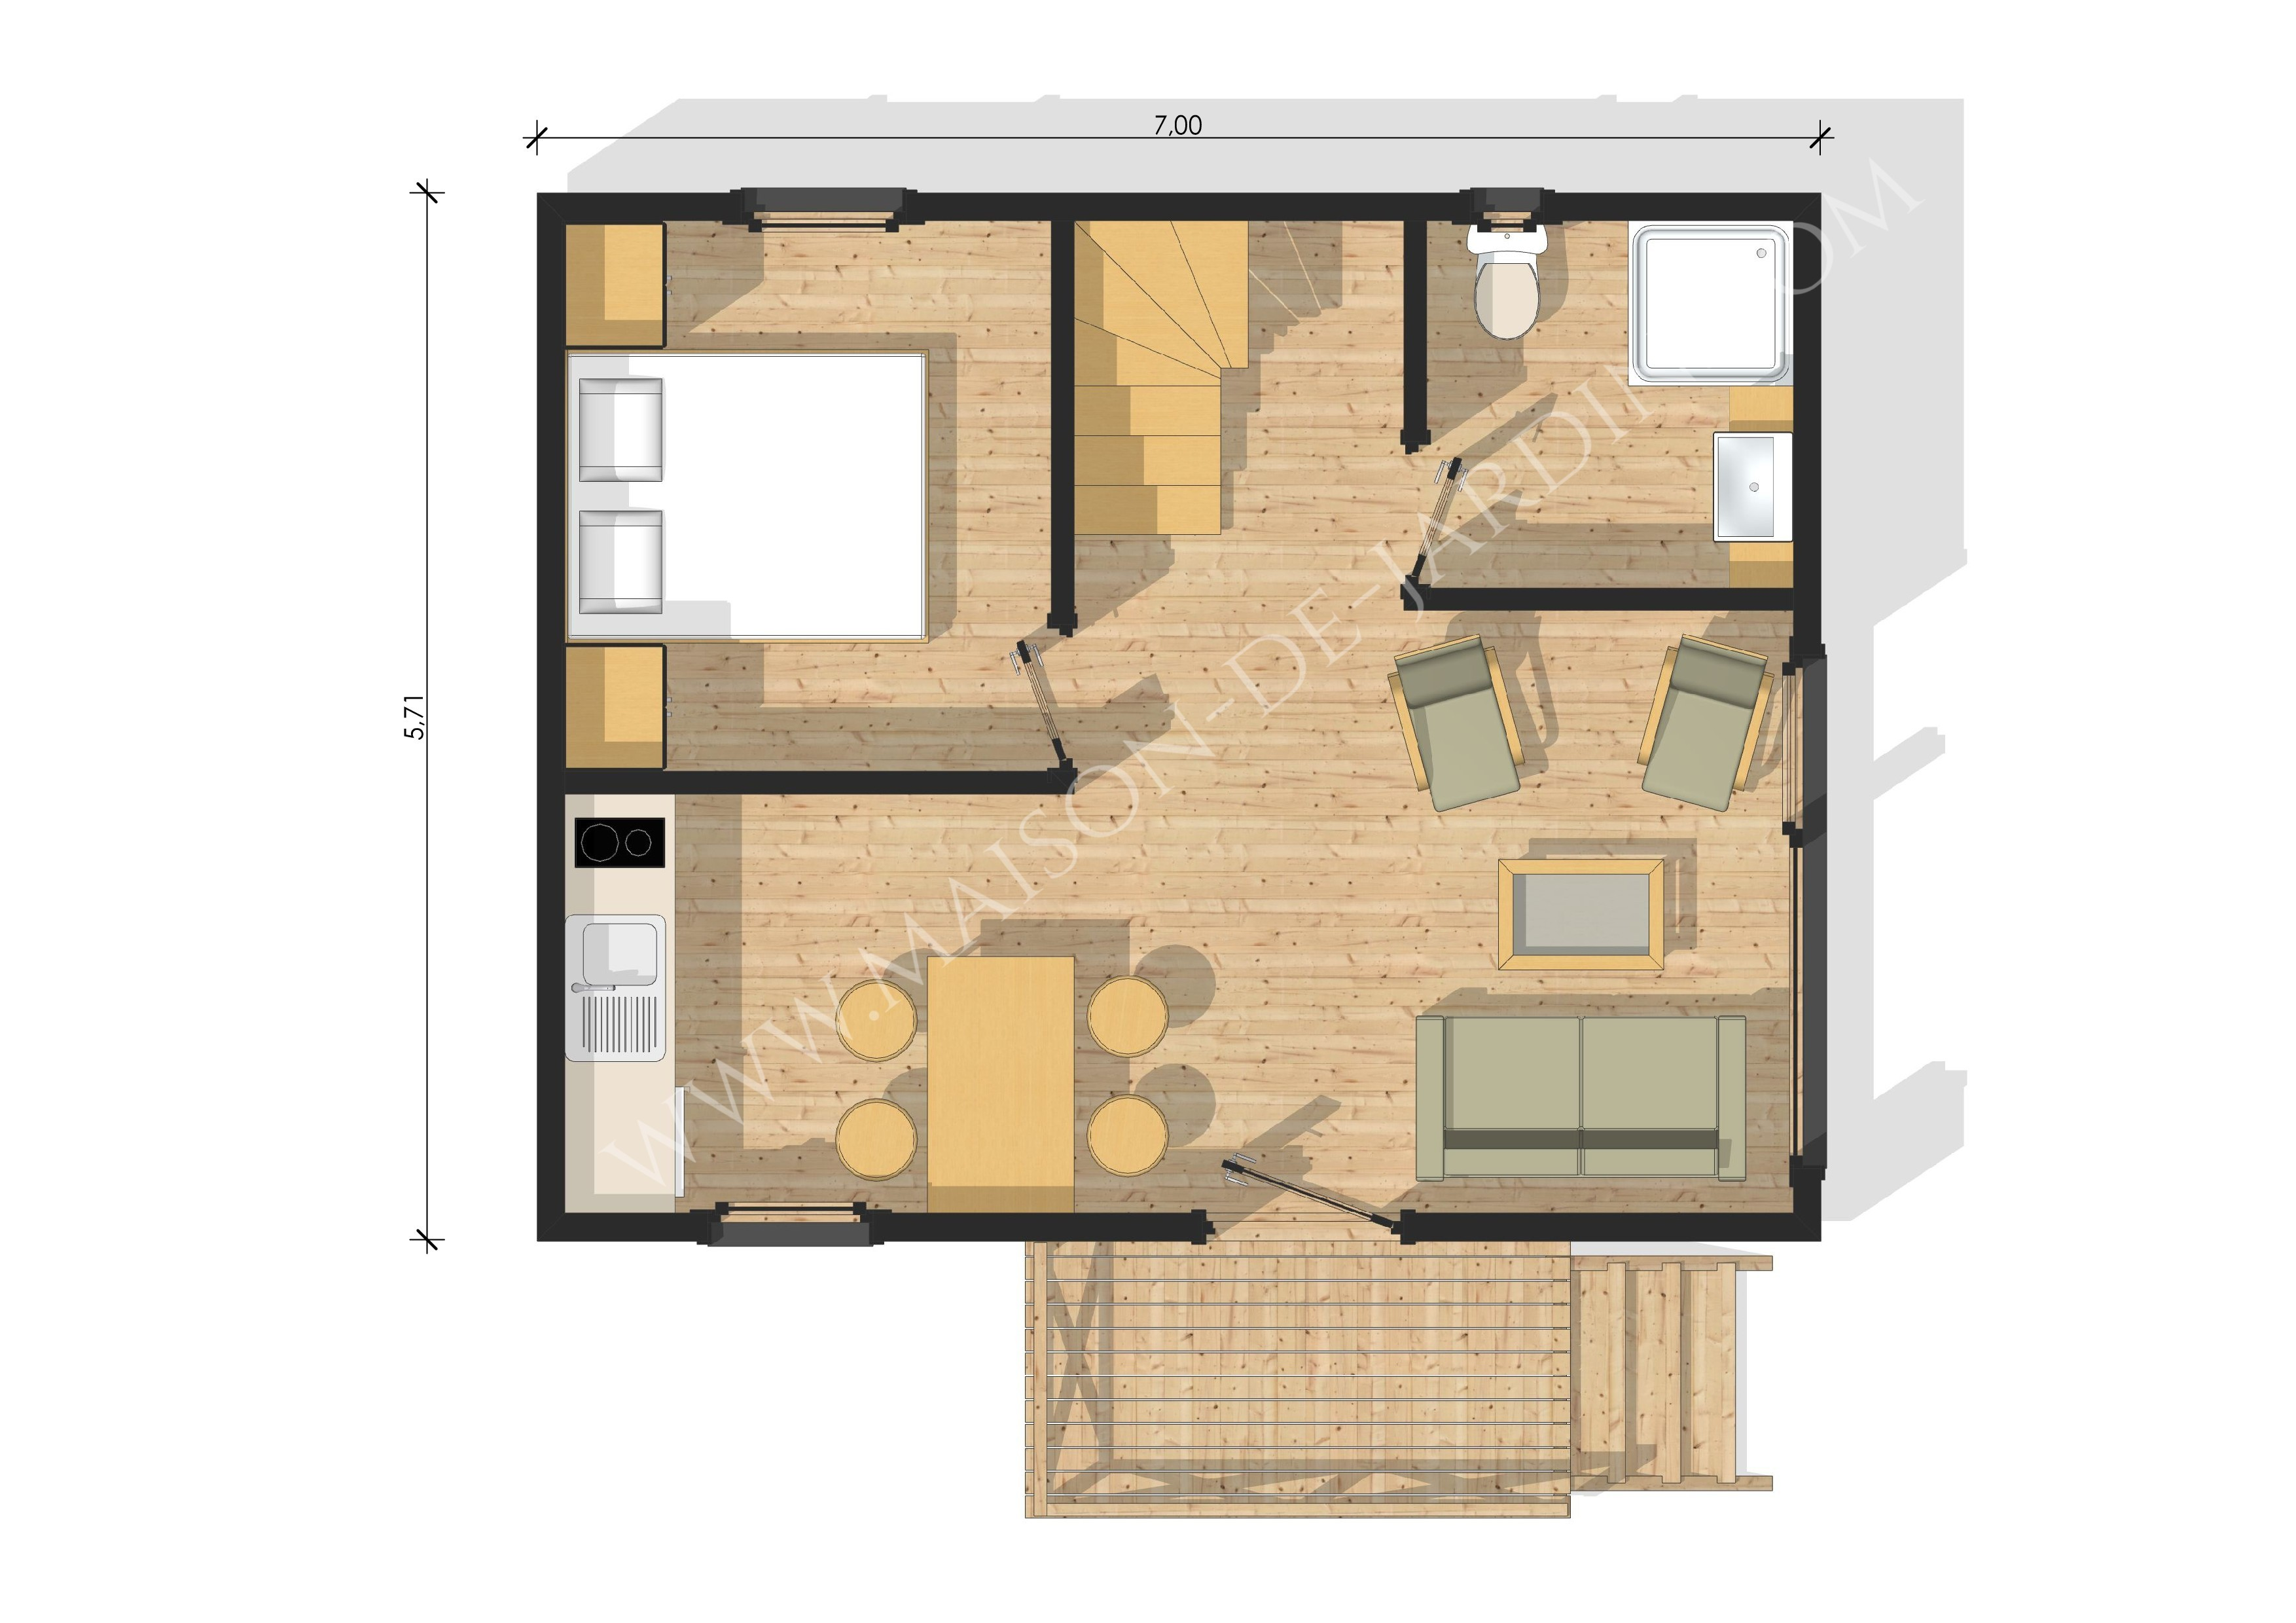 Maison de jardin m diterran e en bois en kit - Plan de studio avec mezzanine ...